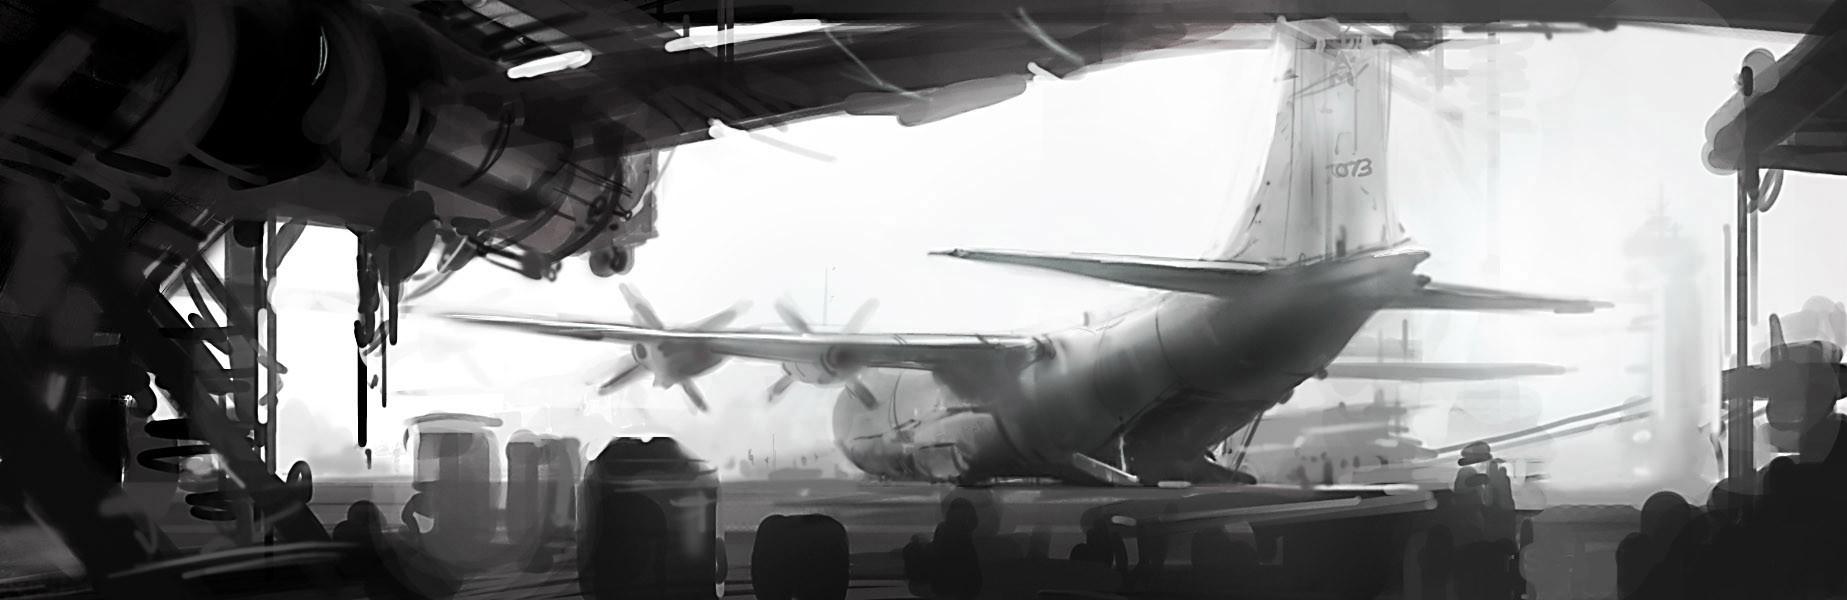 Brian yam 04 r2 iceland hangar sequence